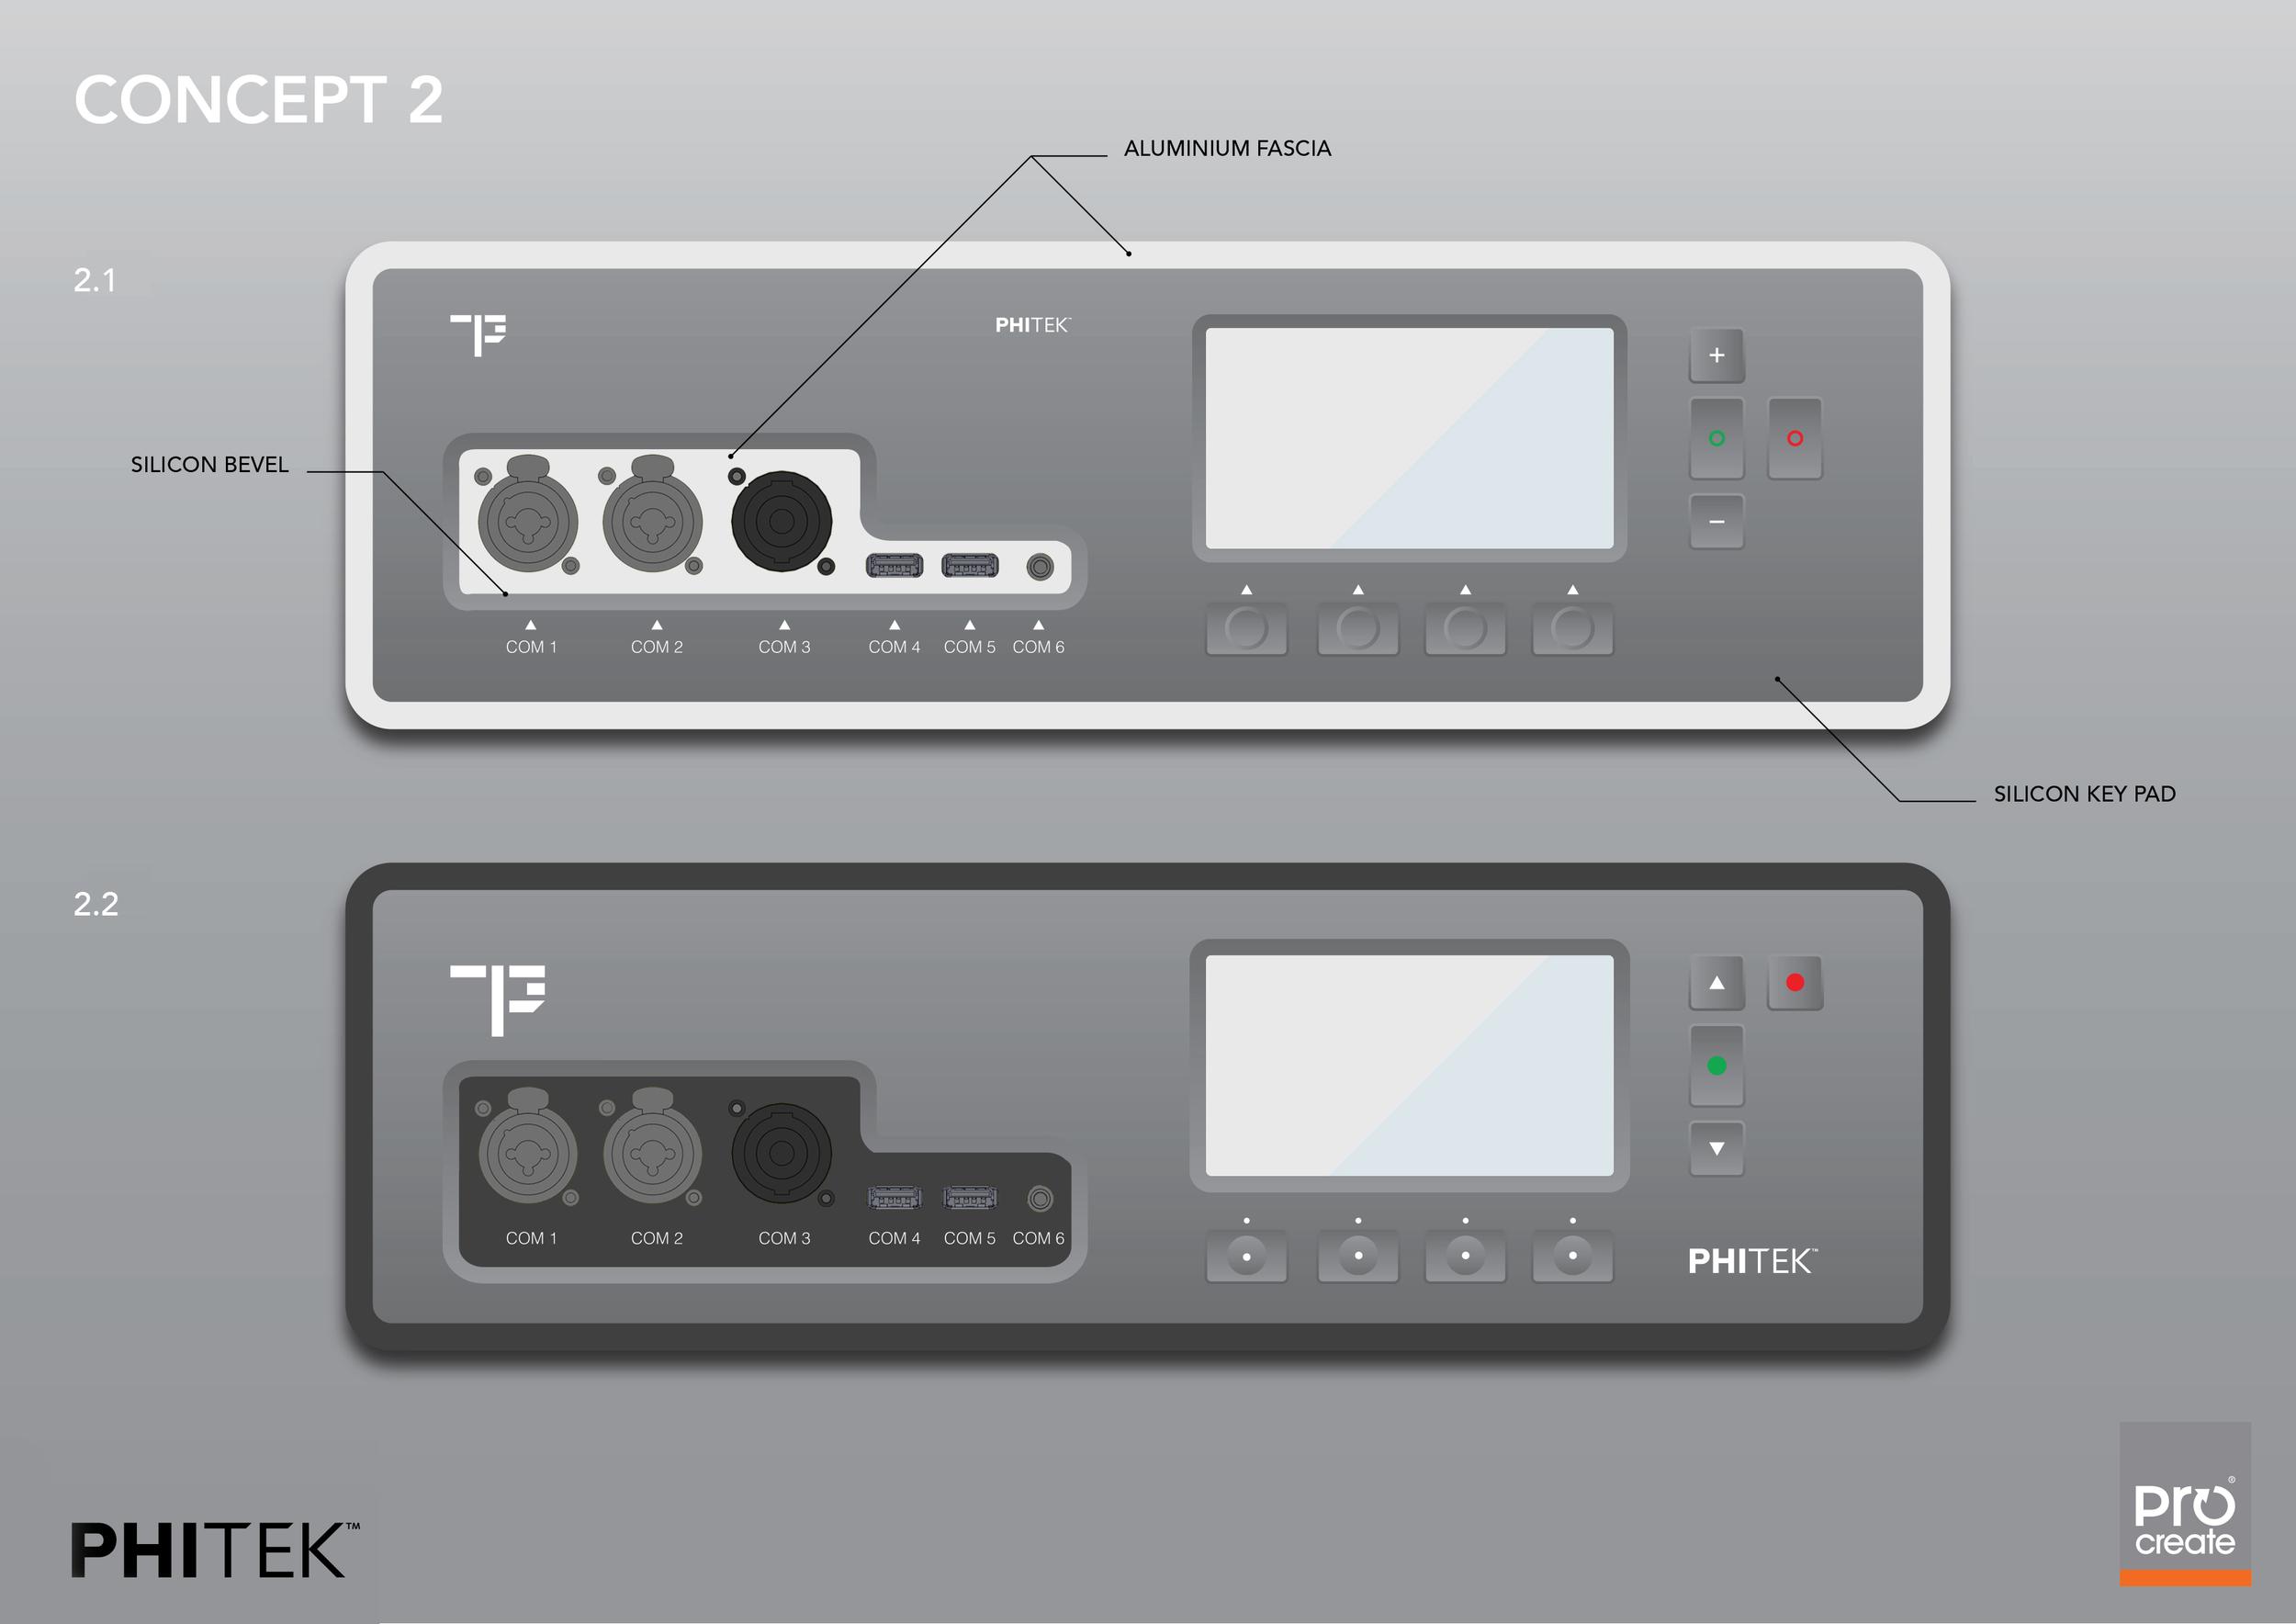 150731_PhiTek Concept 2 Final.jpg